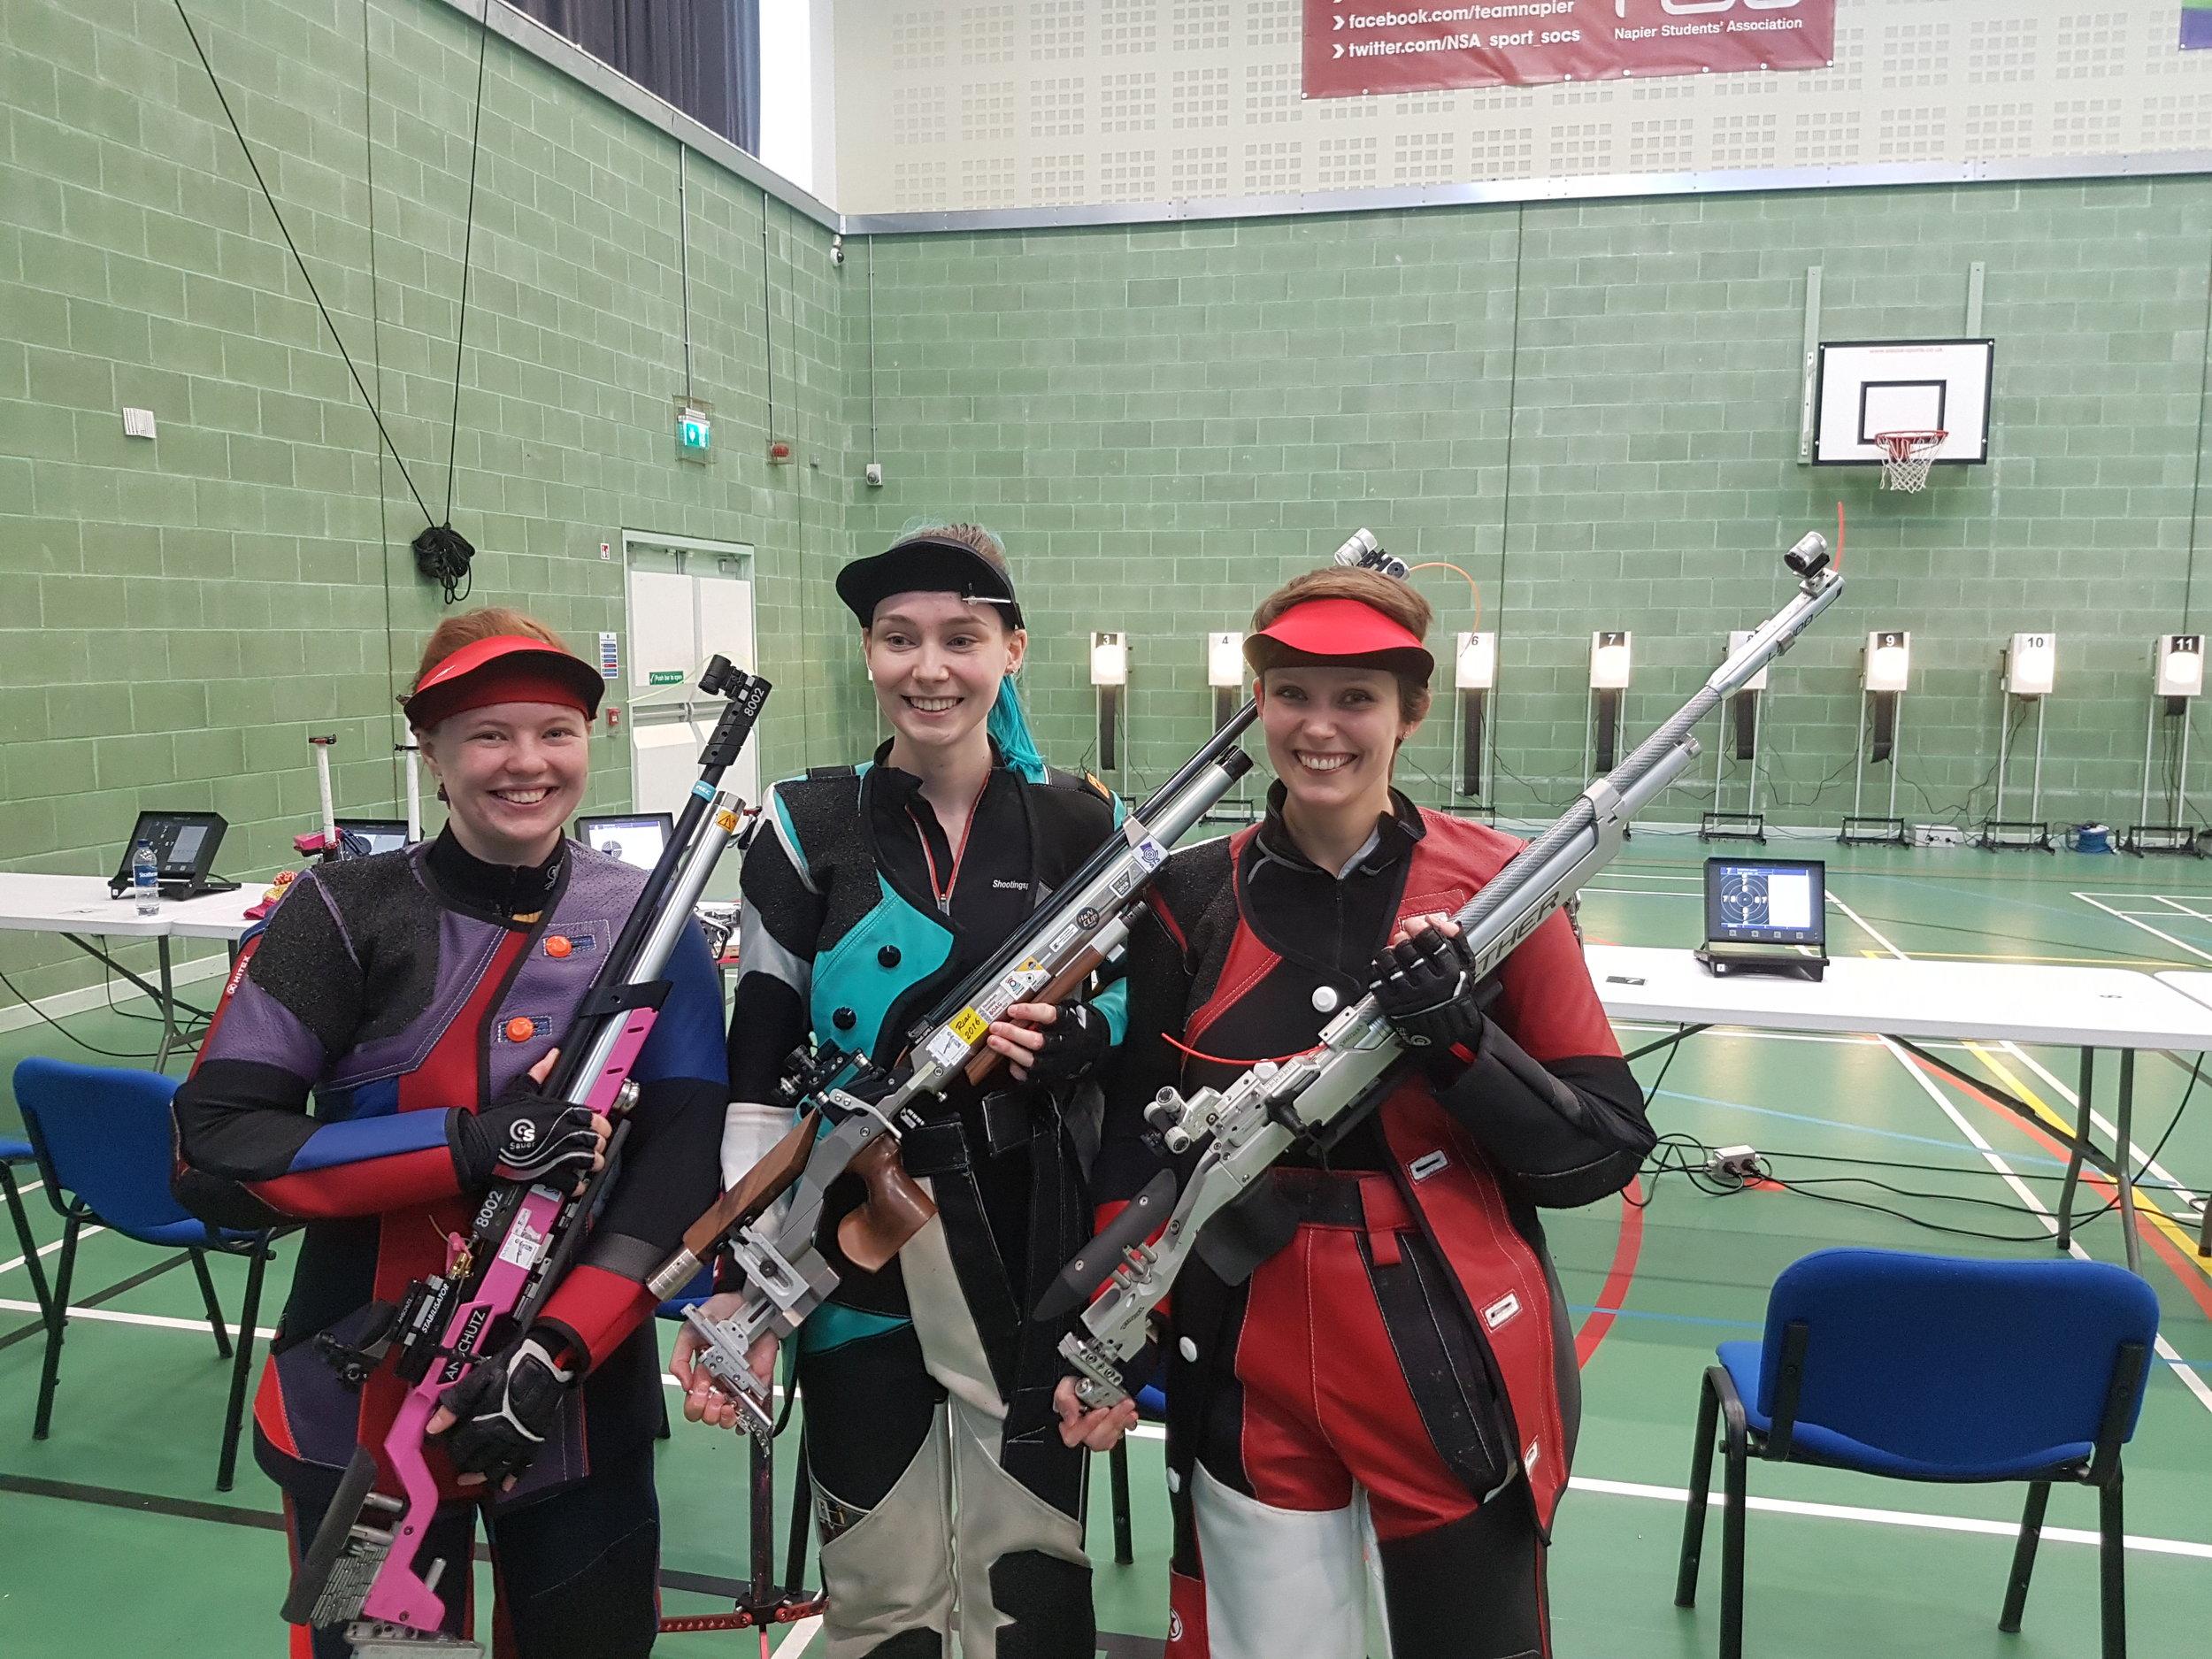 Winners - Women's 10m Air Rifle Championships